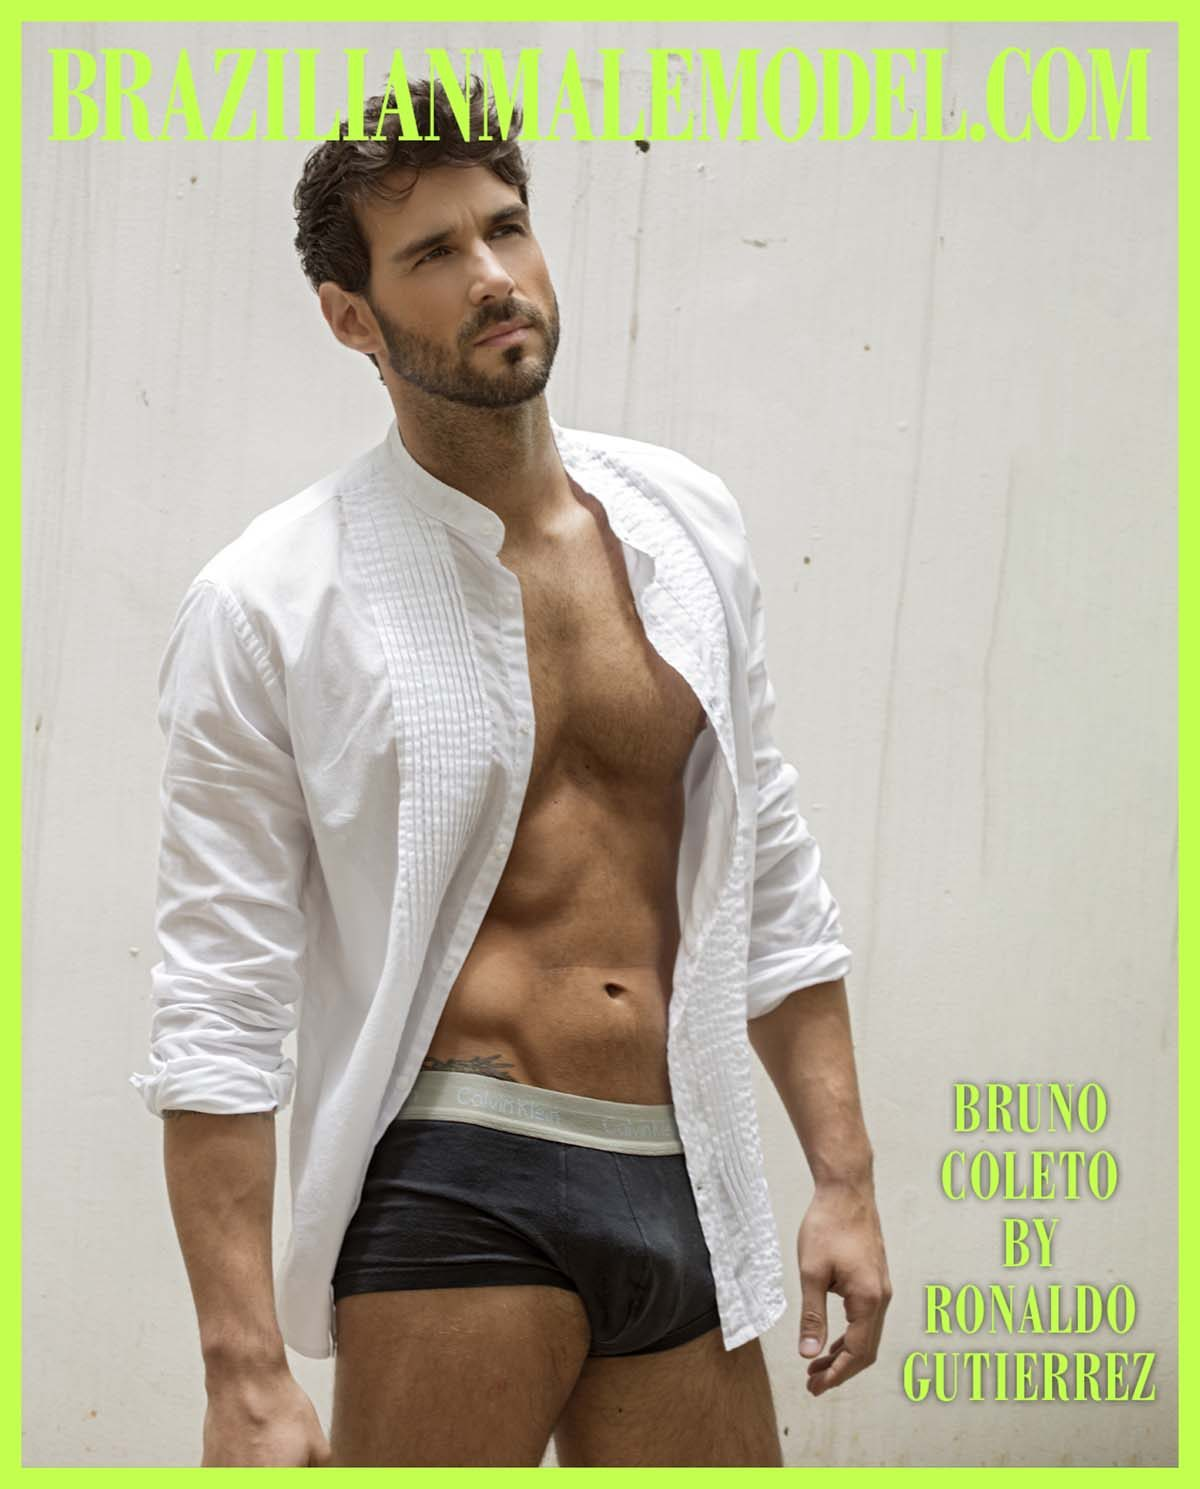 Bruno Coleto by Ronaldo Gutierrez